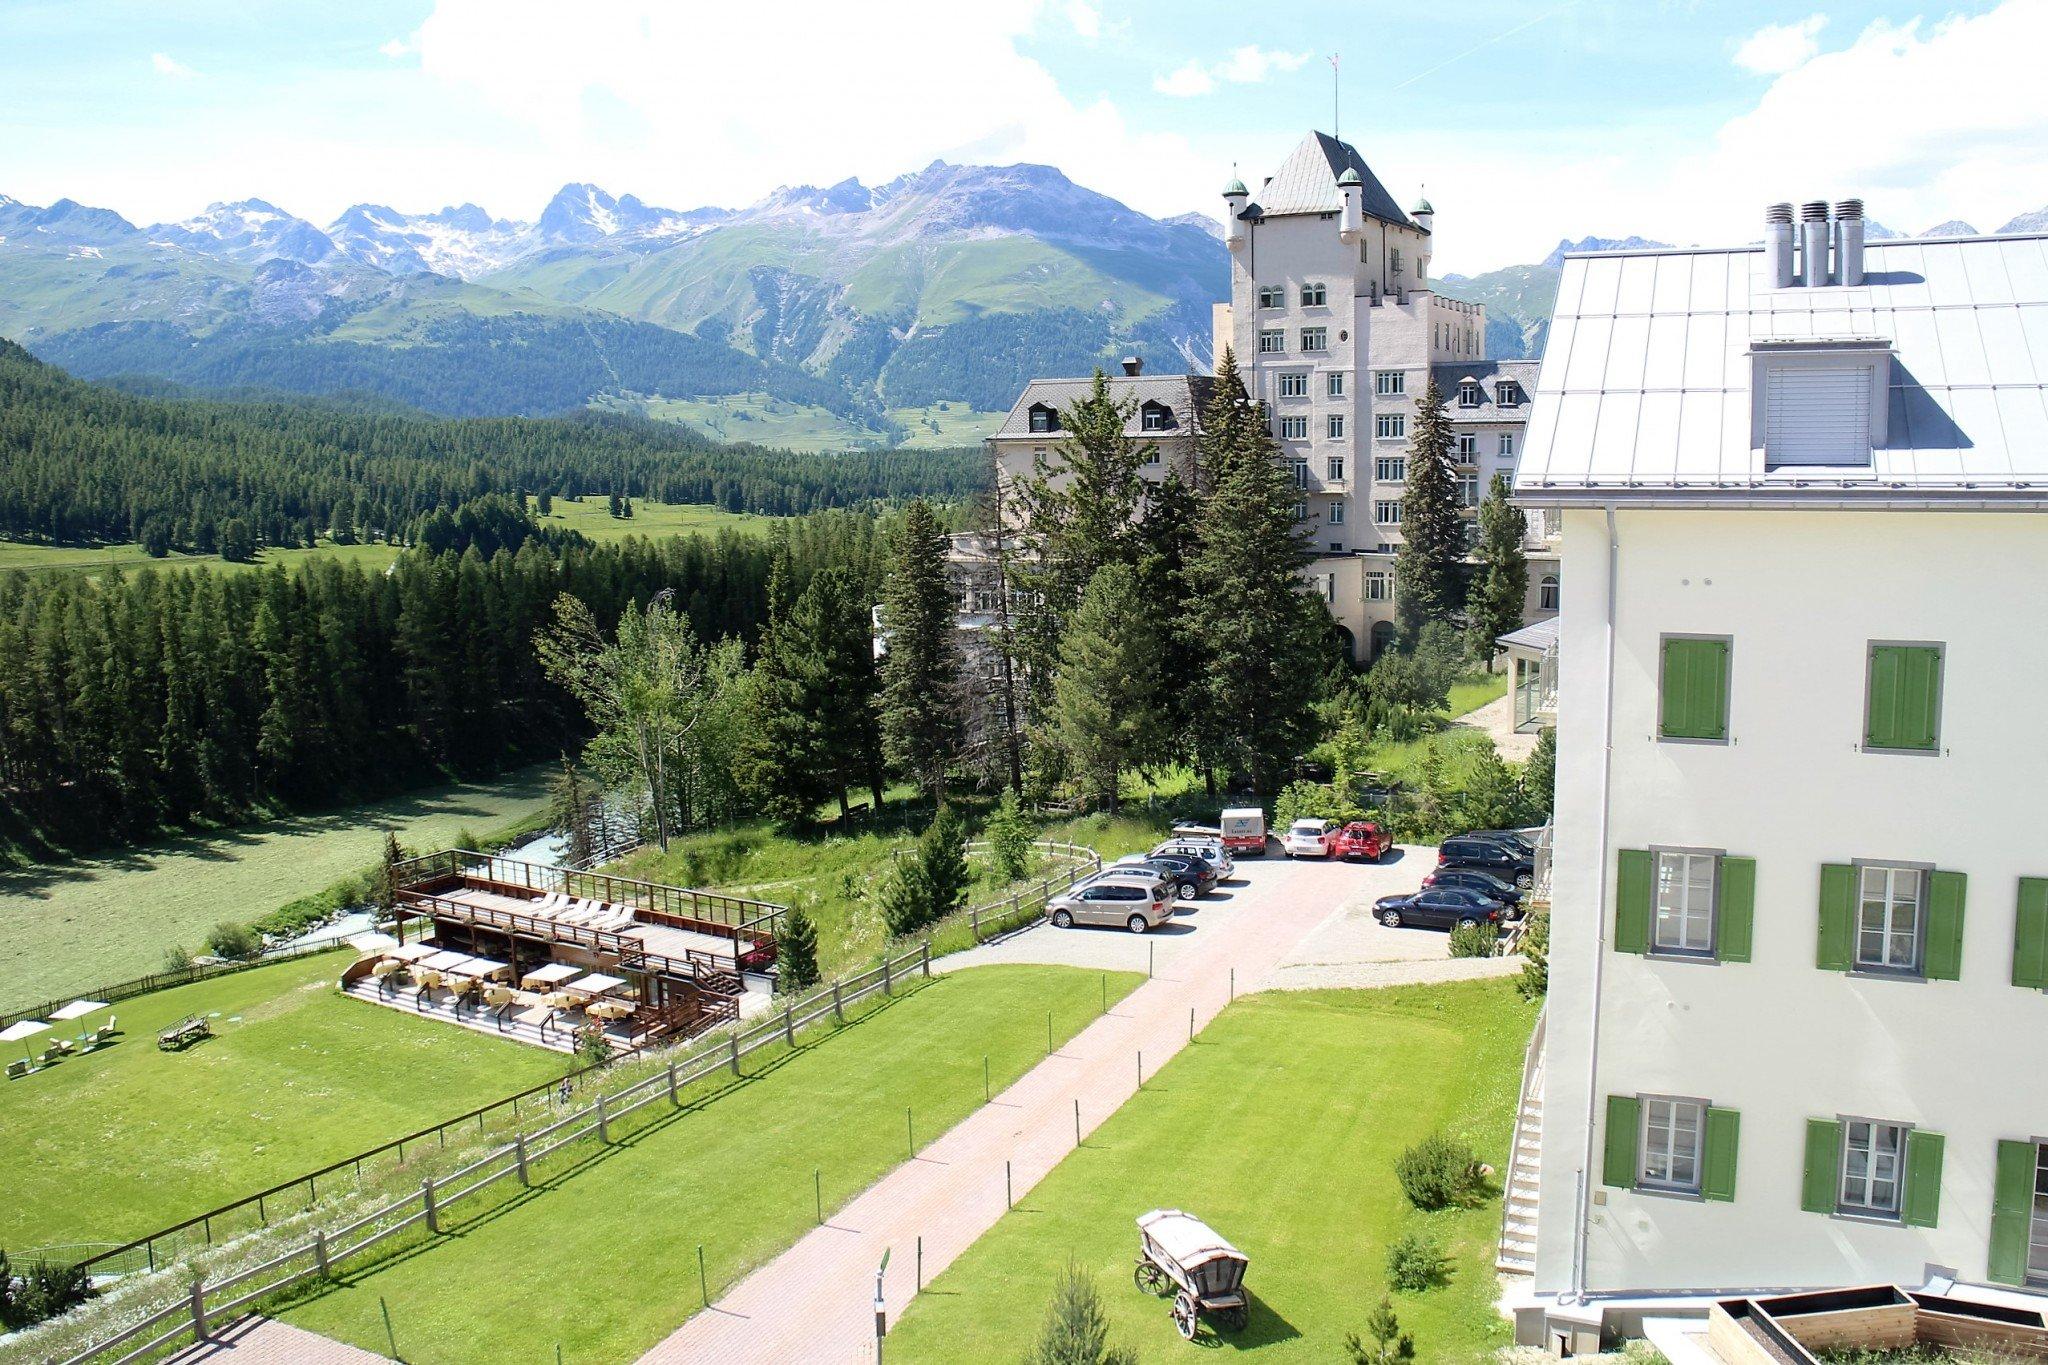 Grand Hotel Kronenhof view from room